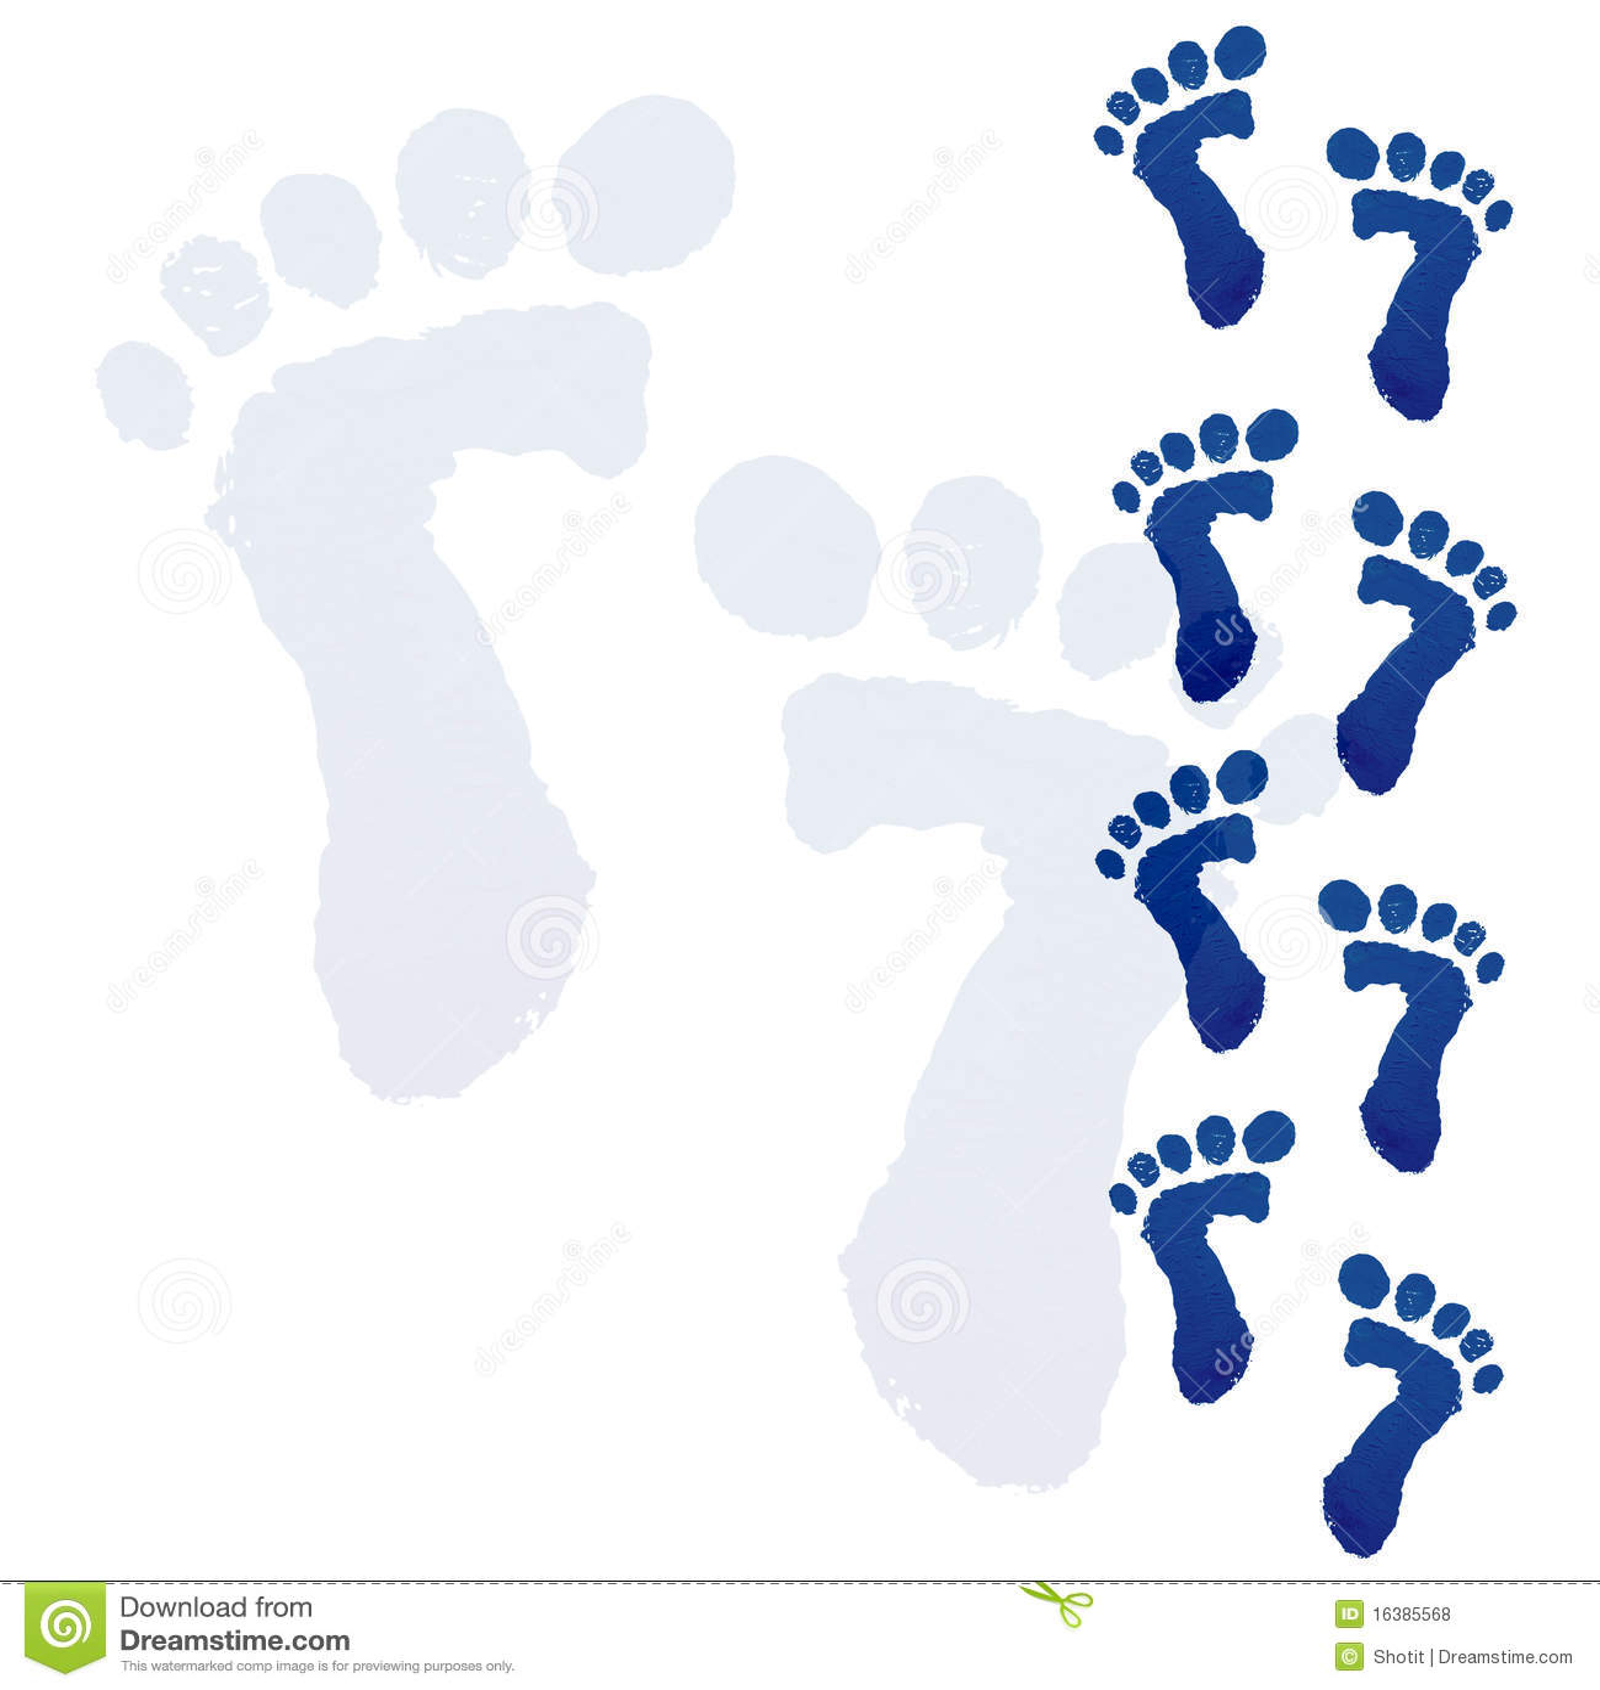 Baby Feet Print Royalty Free Stock Photos Image 16385568